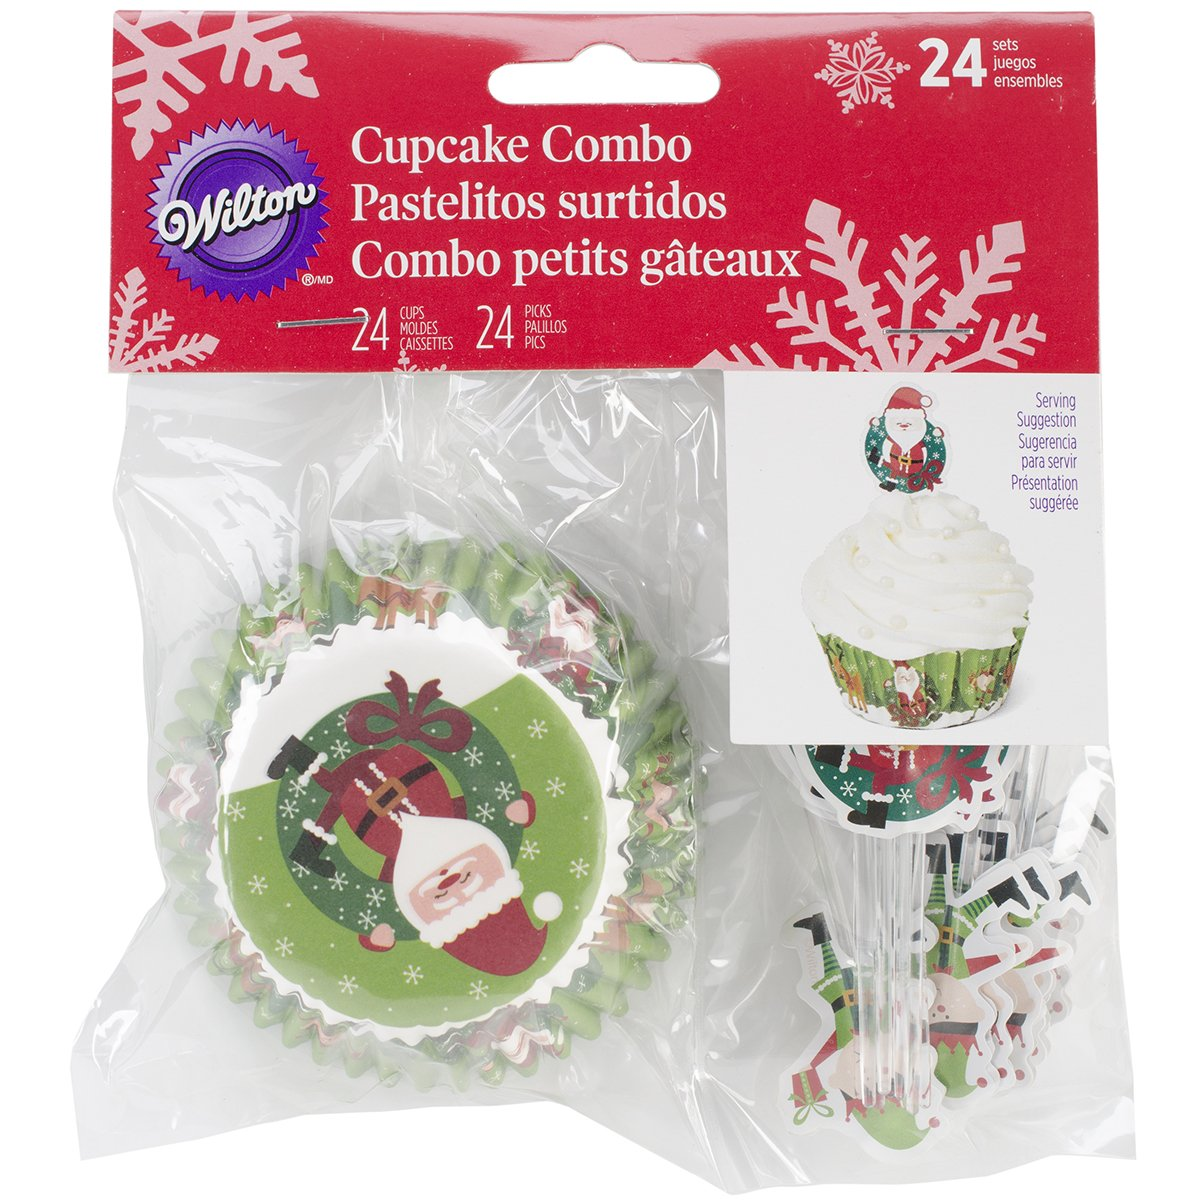 Wilton 415-2661 Christmas Sharing Cupcake Combo Baking Cups and Picks